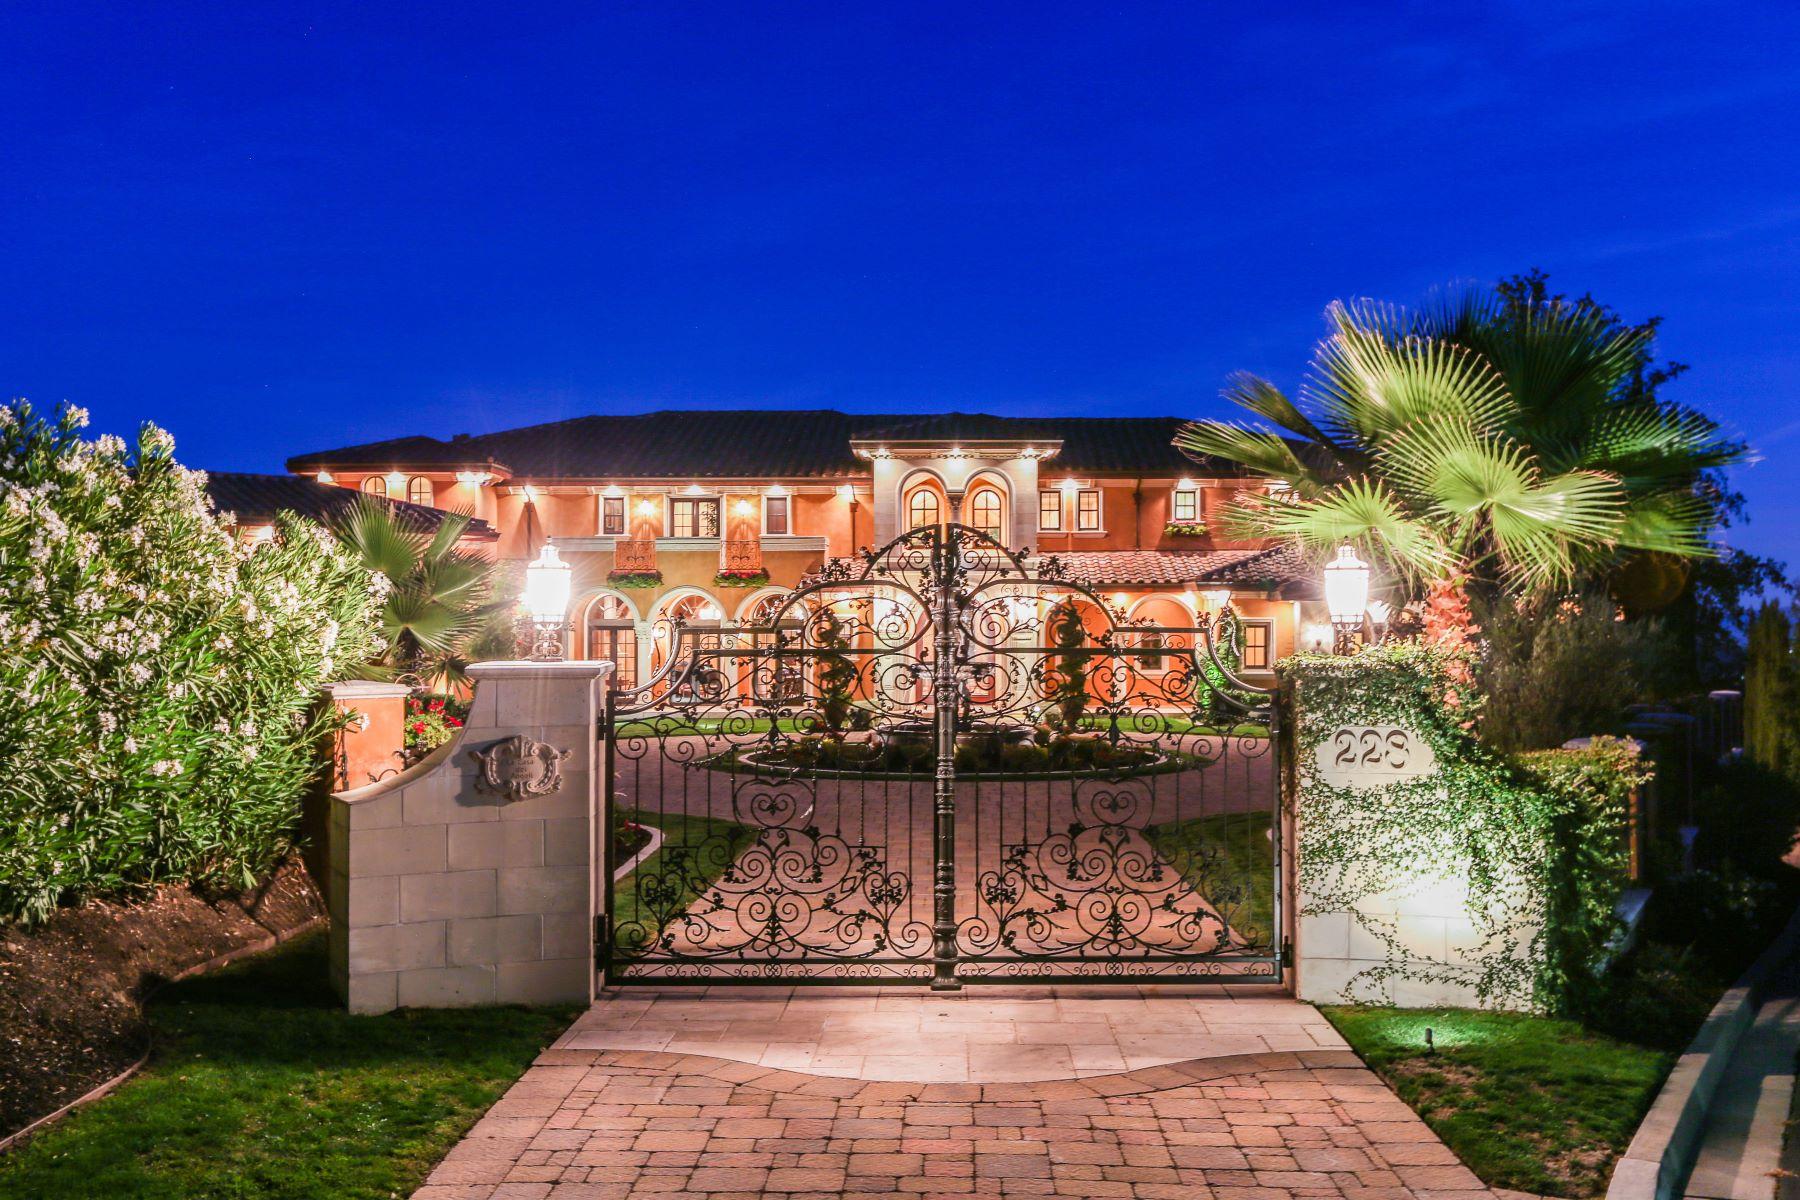 Additional photo for property listing at La Casa dei Angeli 228 South Ridge Court Danville, California 94506 United States